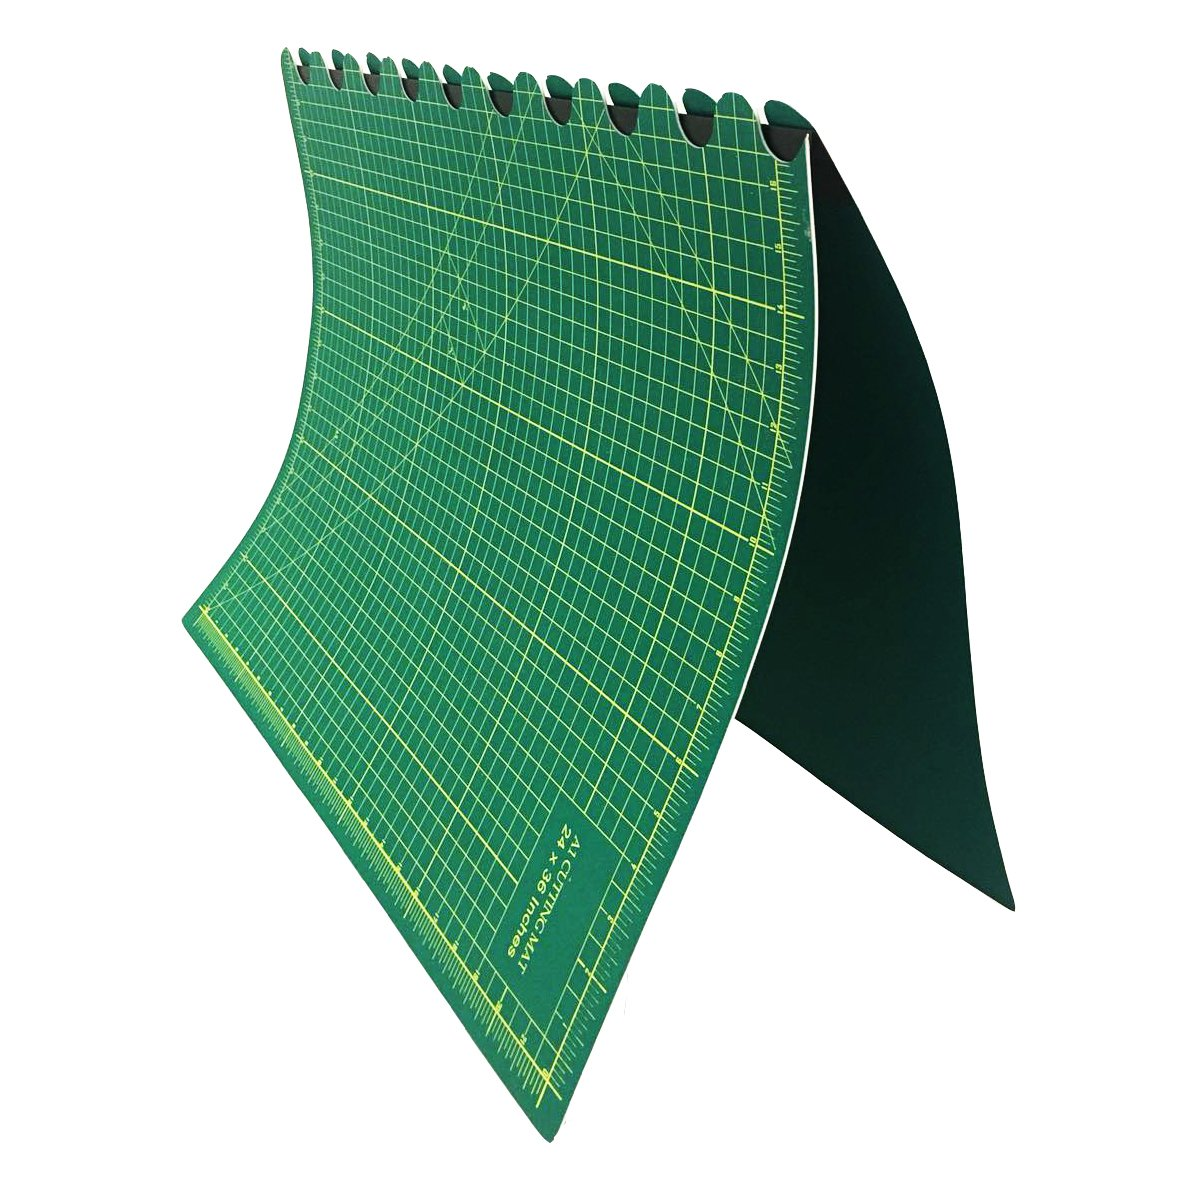 Fineway High Quality Folding A1 Cutting Mat Size Non Slip Self Healing Printed Grid Craft Design Foldable Fineway.